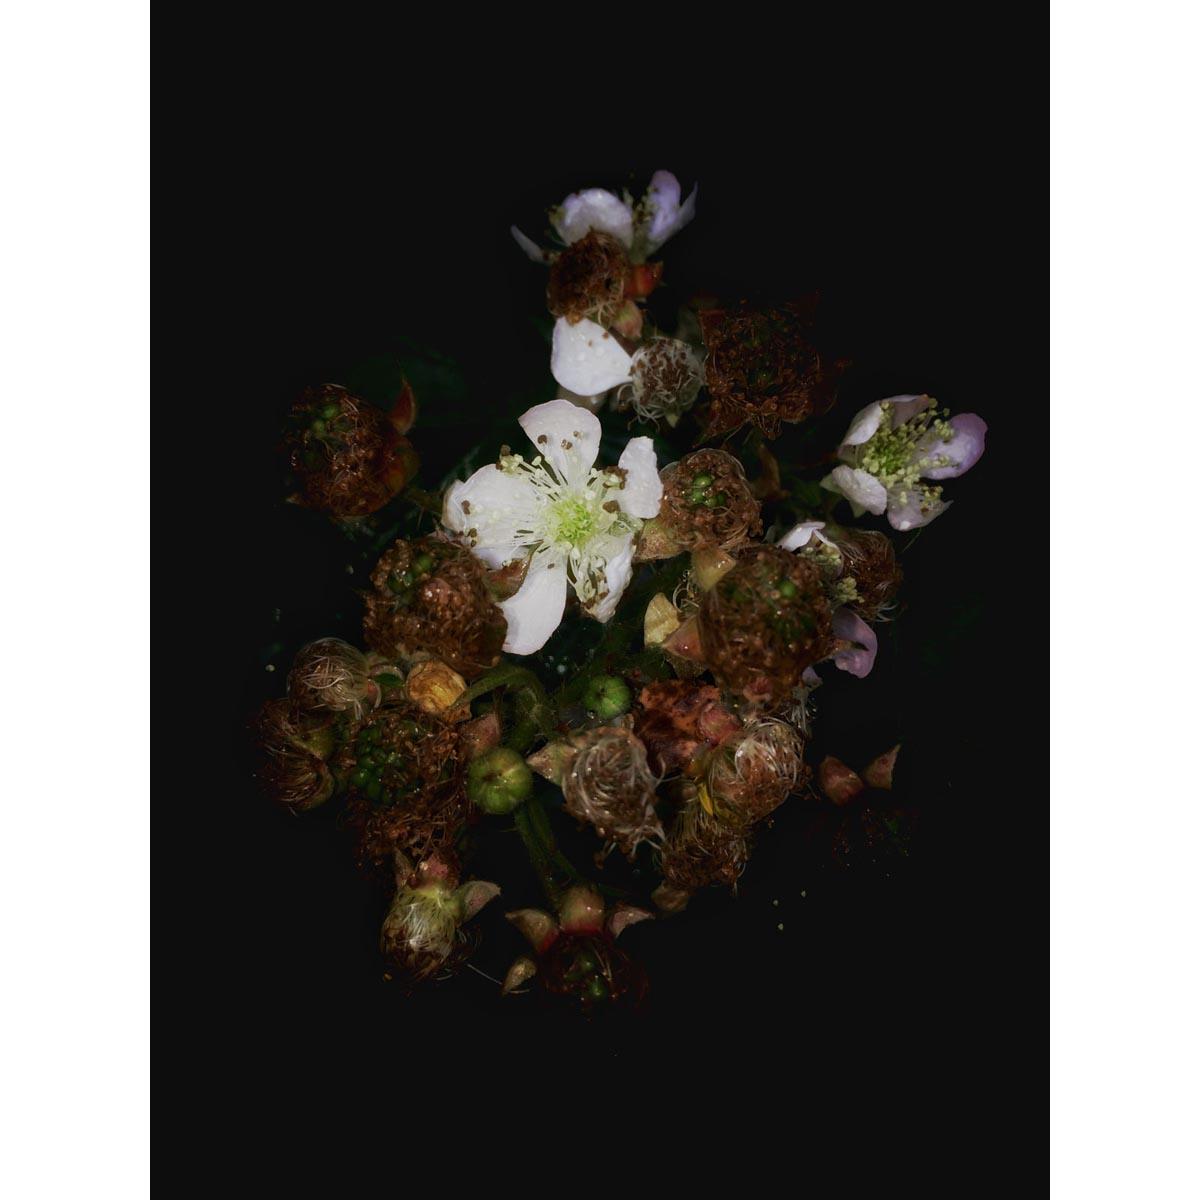 Contemporary fine art photograph of a blackberry blossom by Stephen S T Bradley - photo 1167